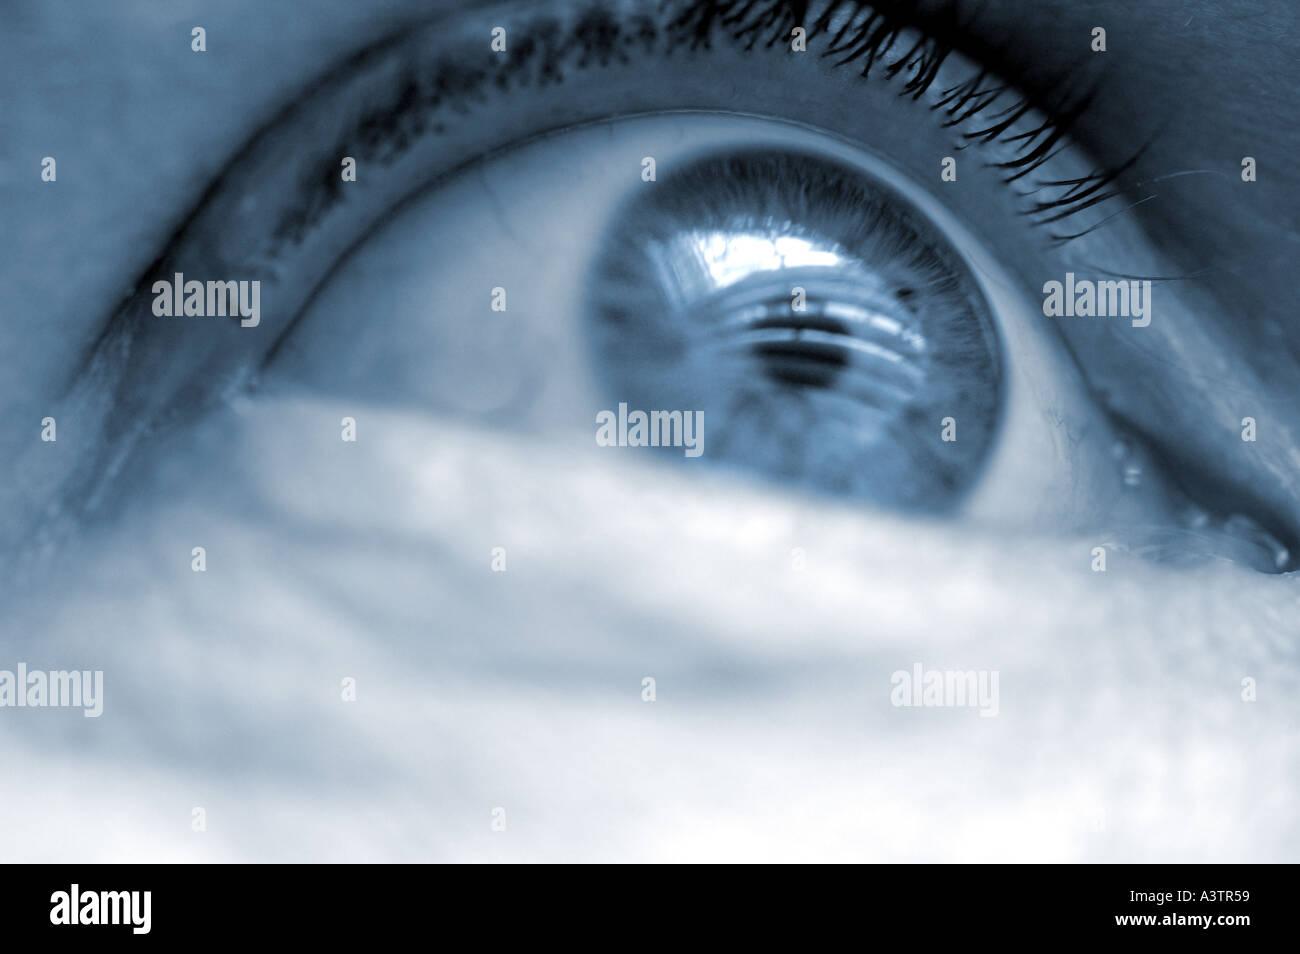 Eye looking towards future - Stock Image